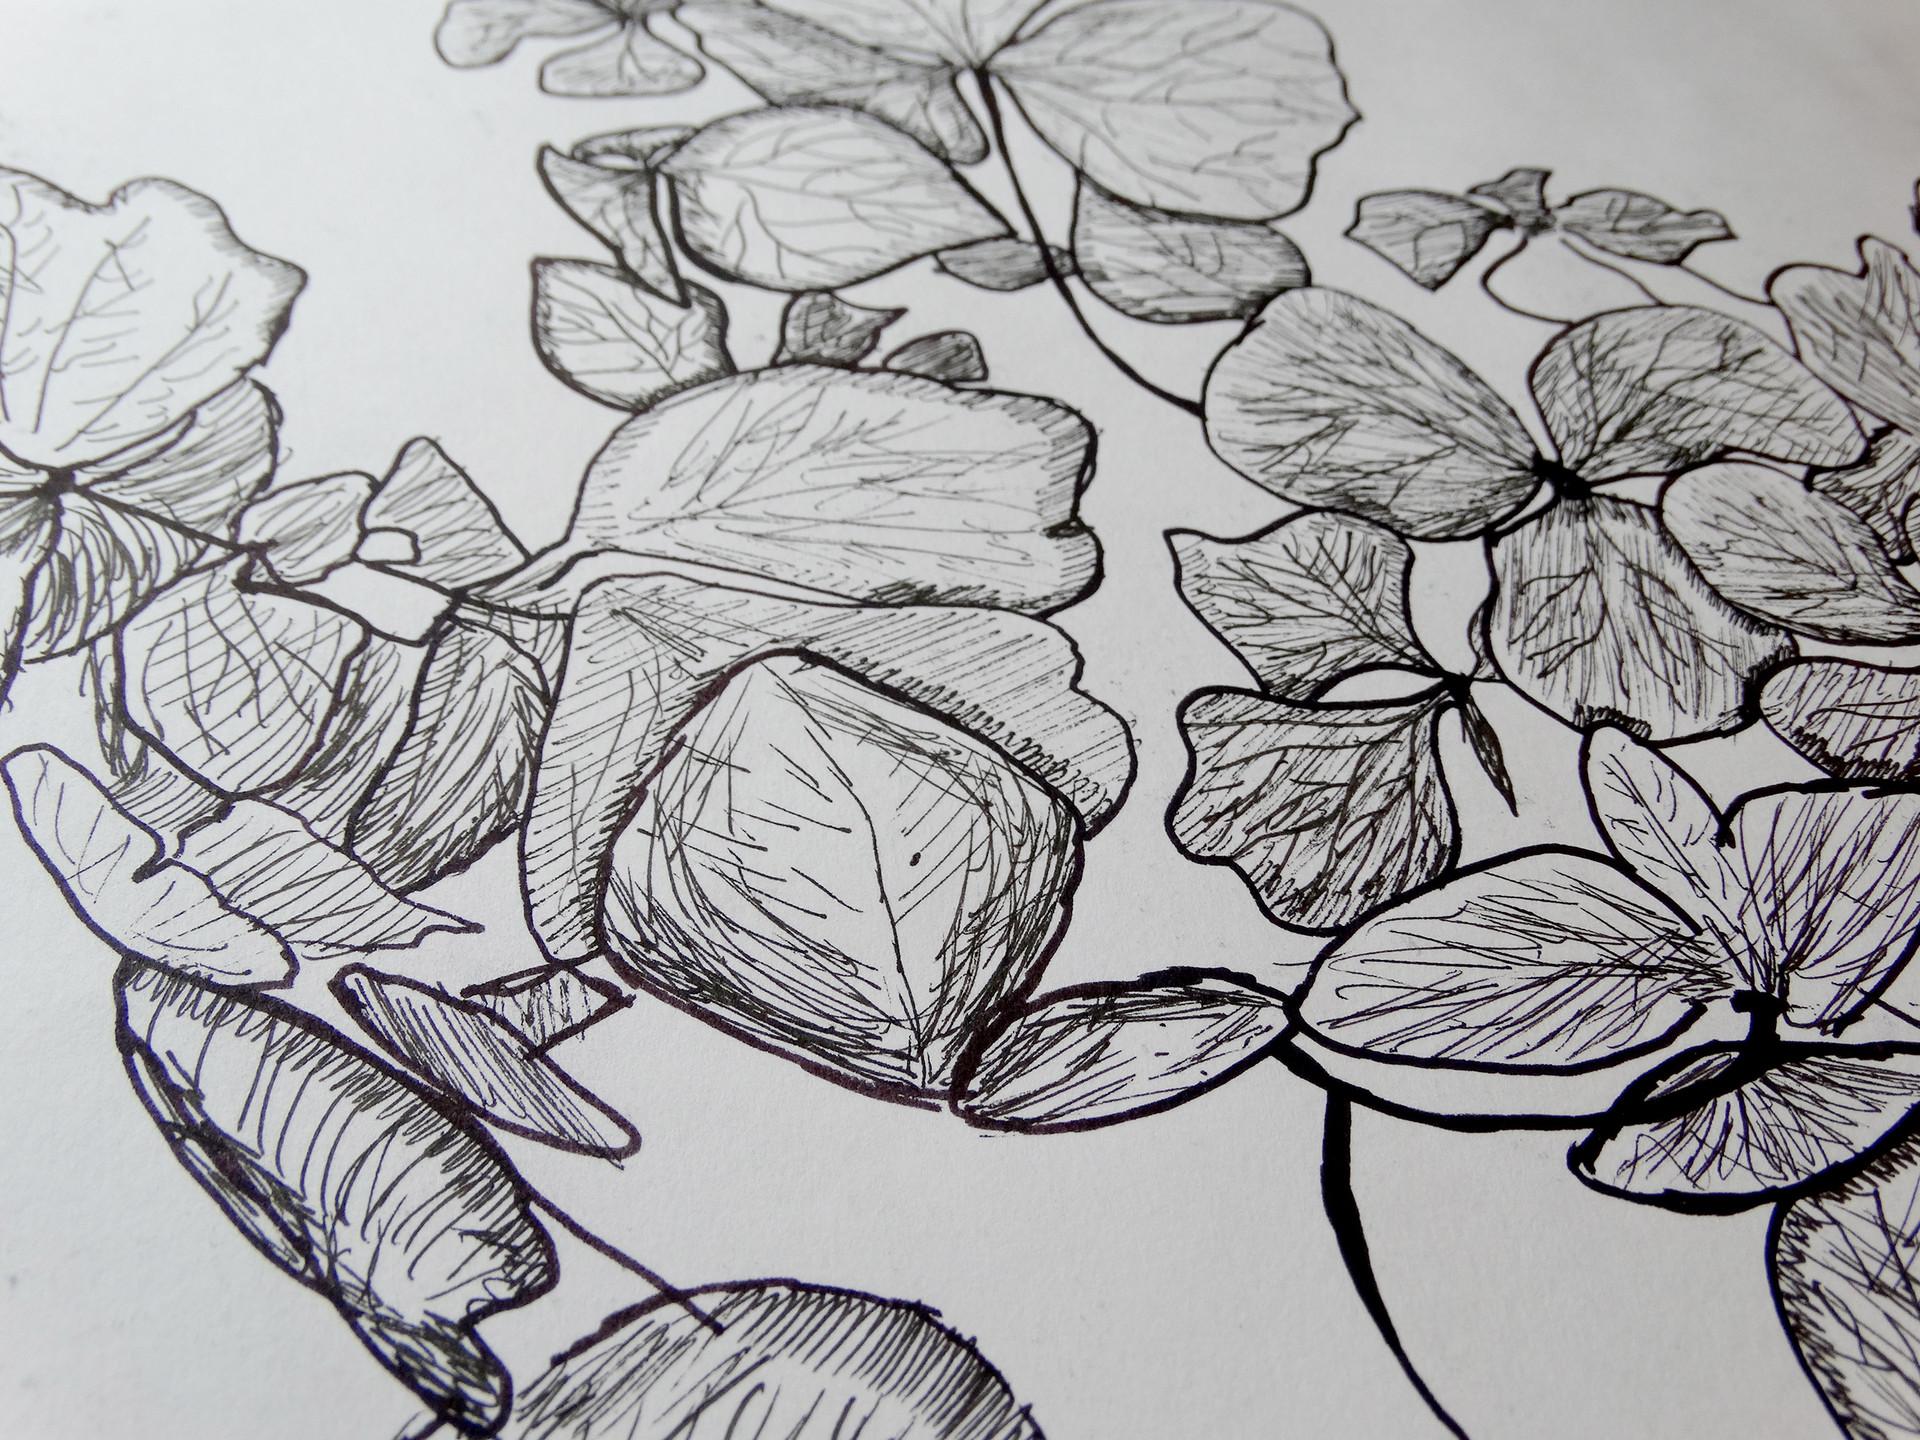 hand-drawn illustration of a hydrangea